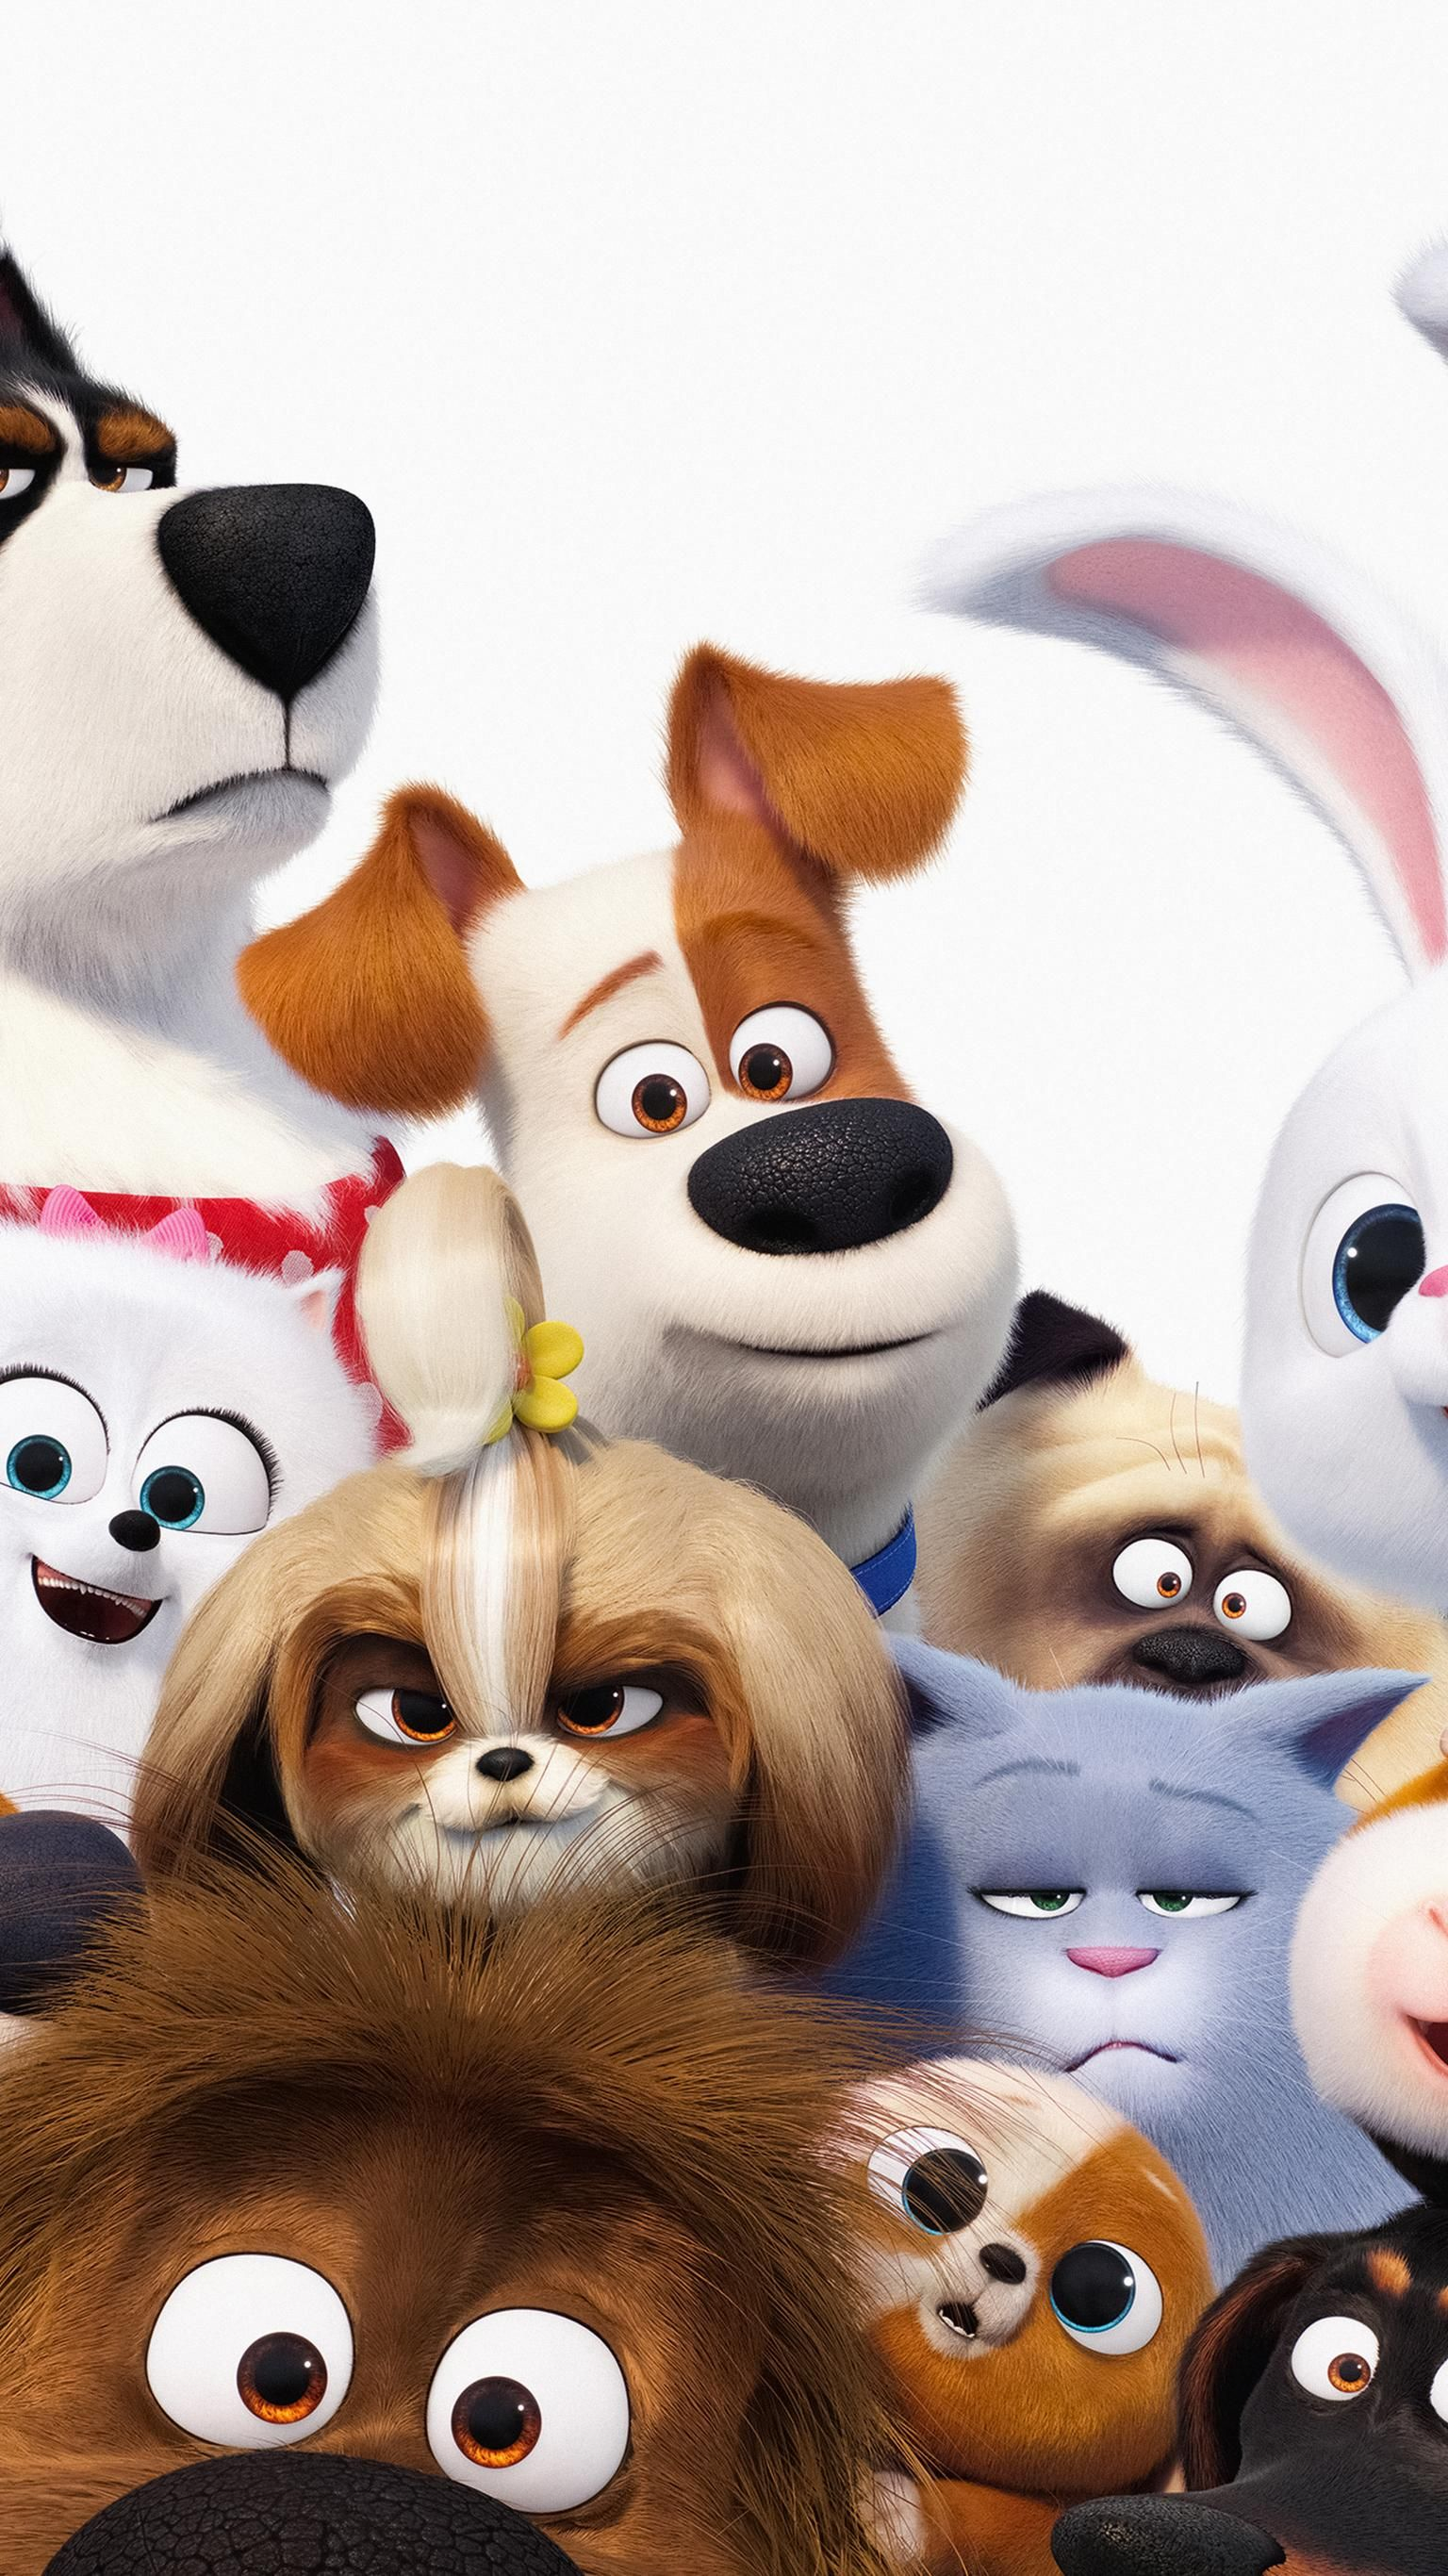 The Secret Life of Pets 2 (2019) Phone Wallpaper | Moviemania